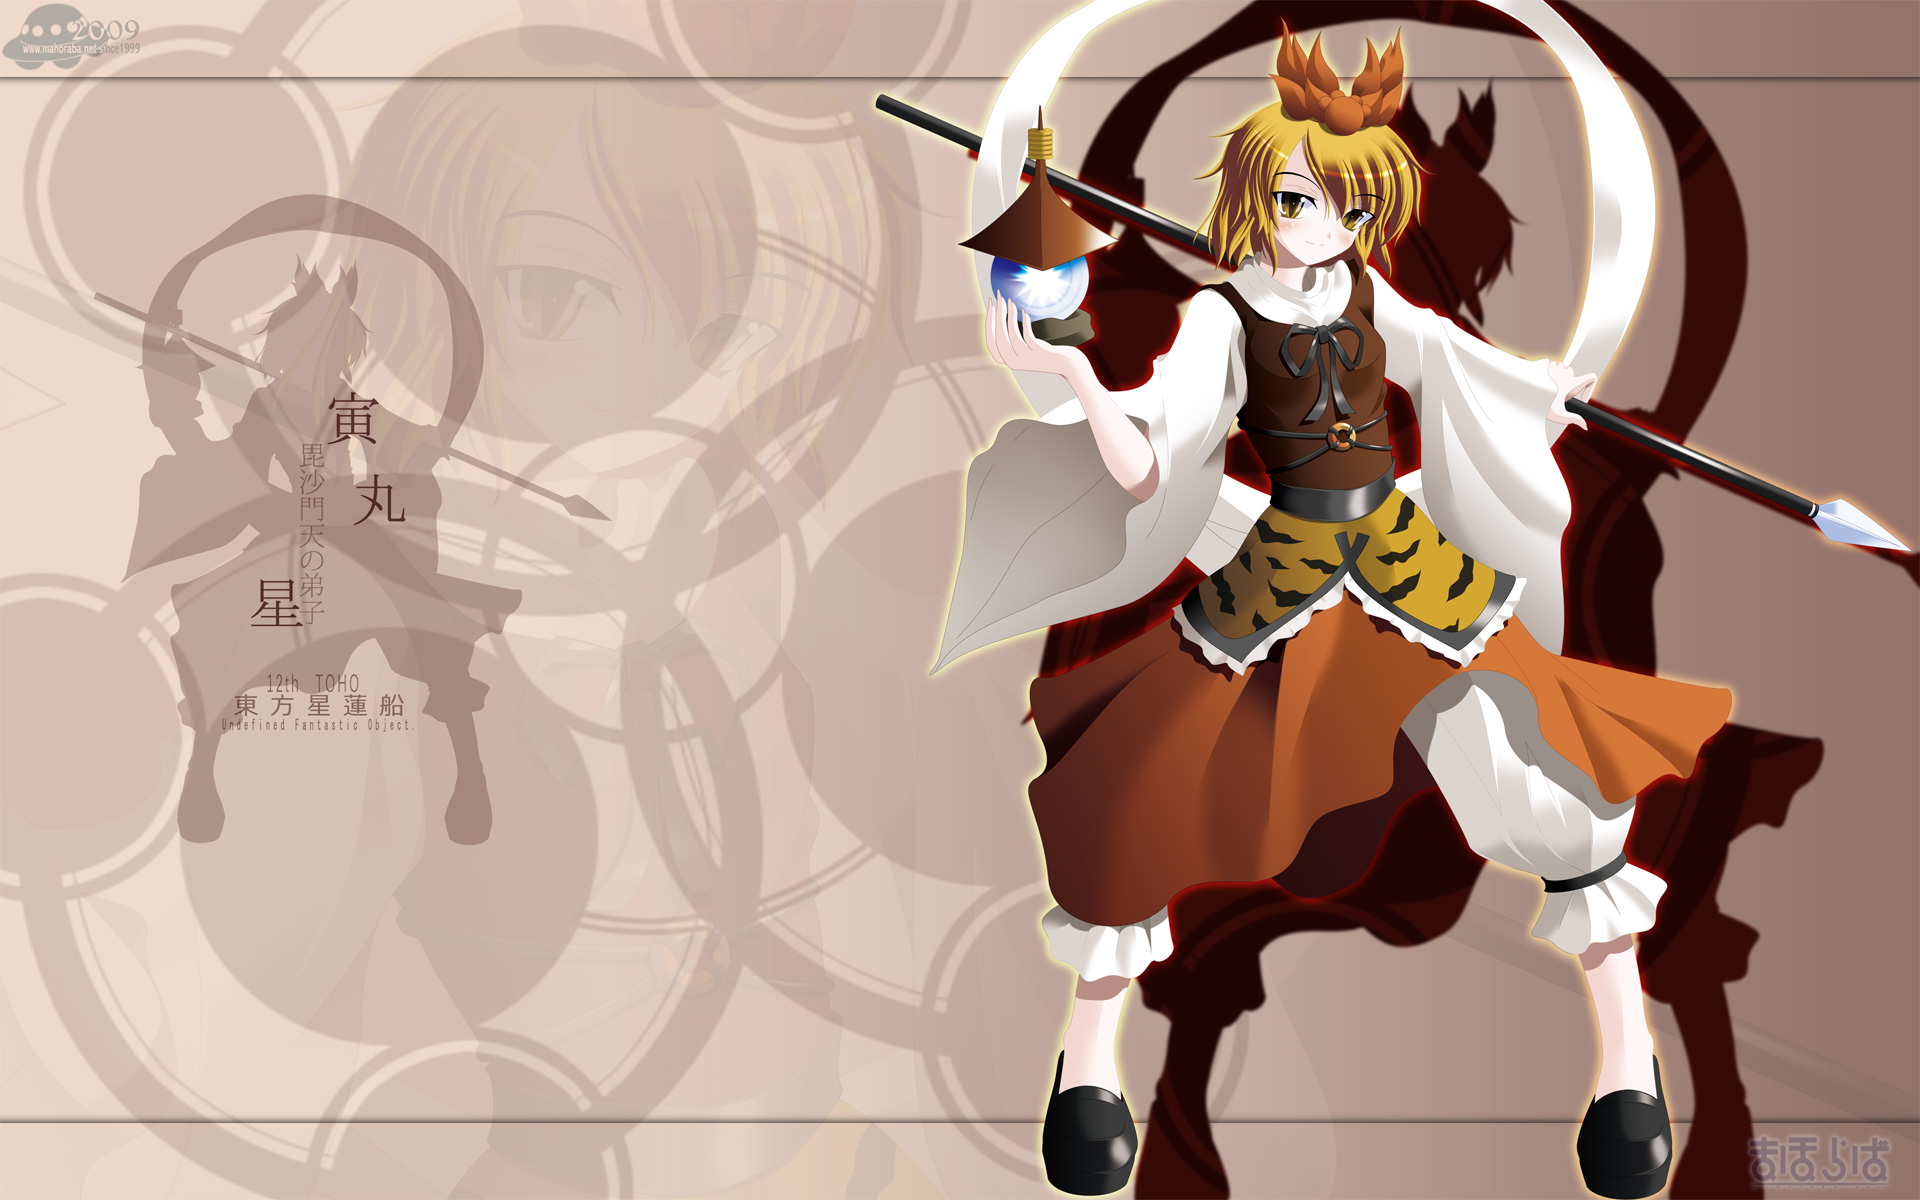 brown_eyes brown_hair short_hair side_b spear toramaru_shou touhou weapon